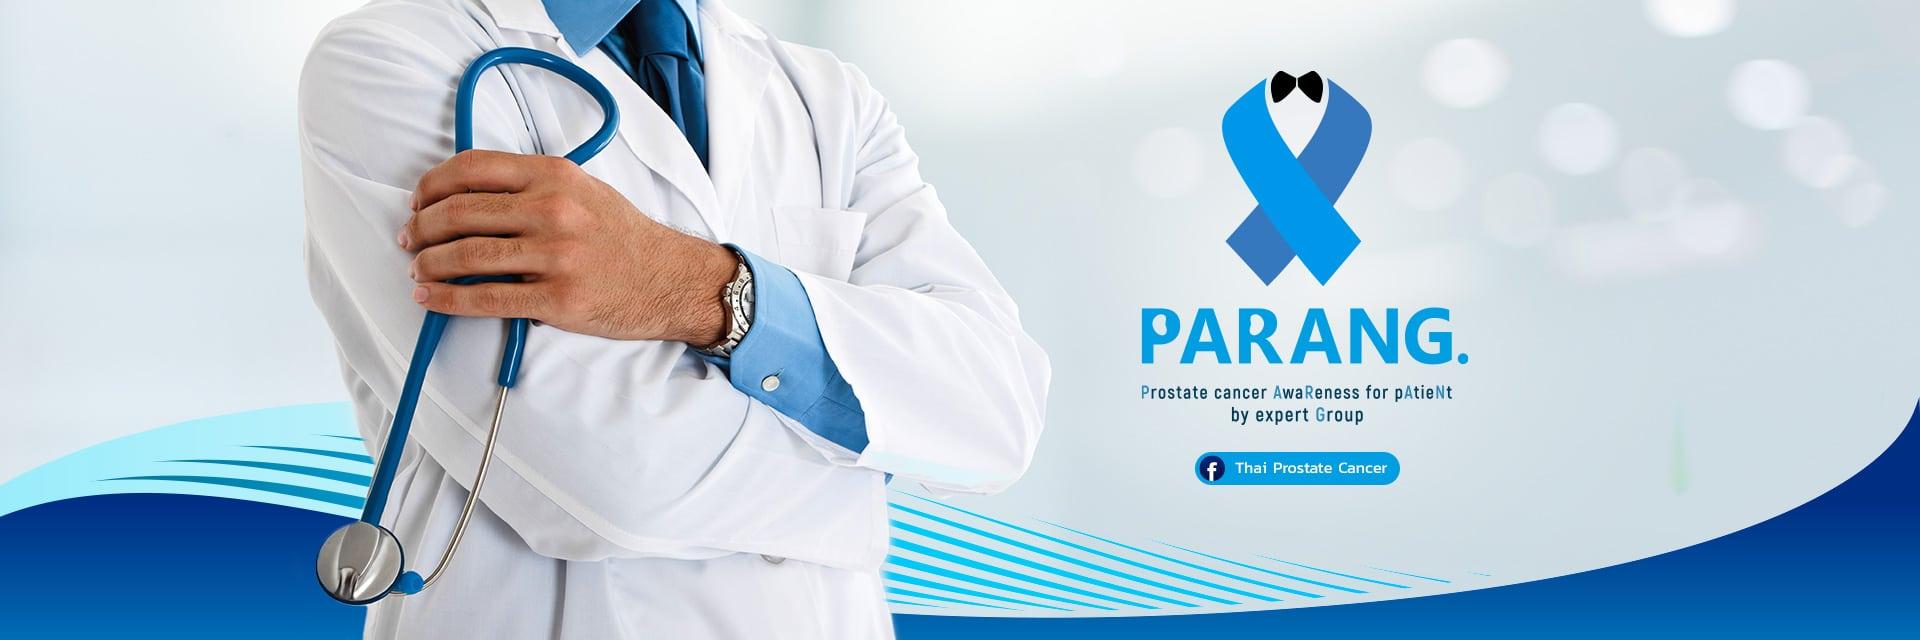 thaiprostatecancer มะเร็งต่อมลูกหมาก